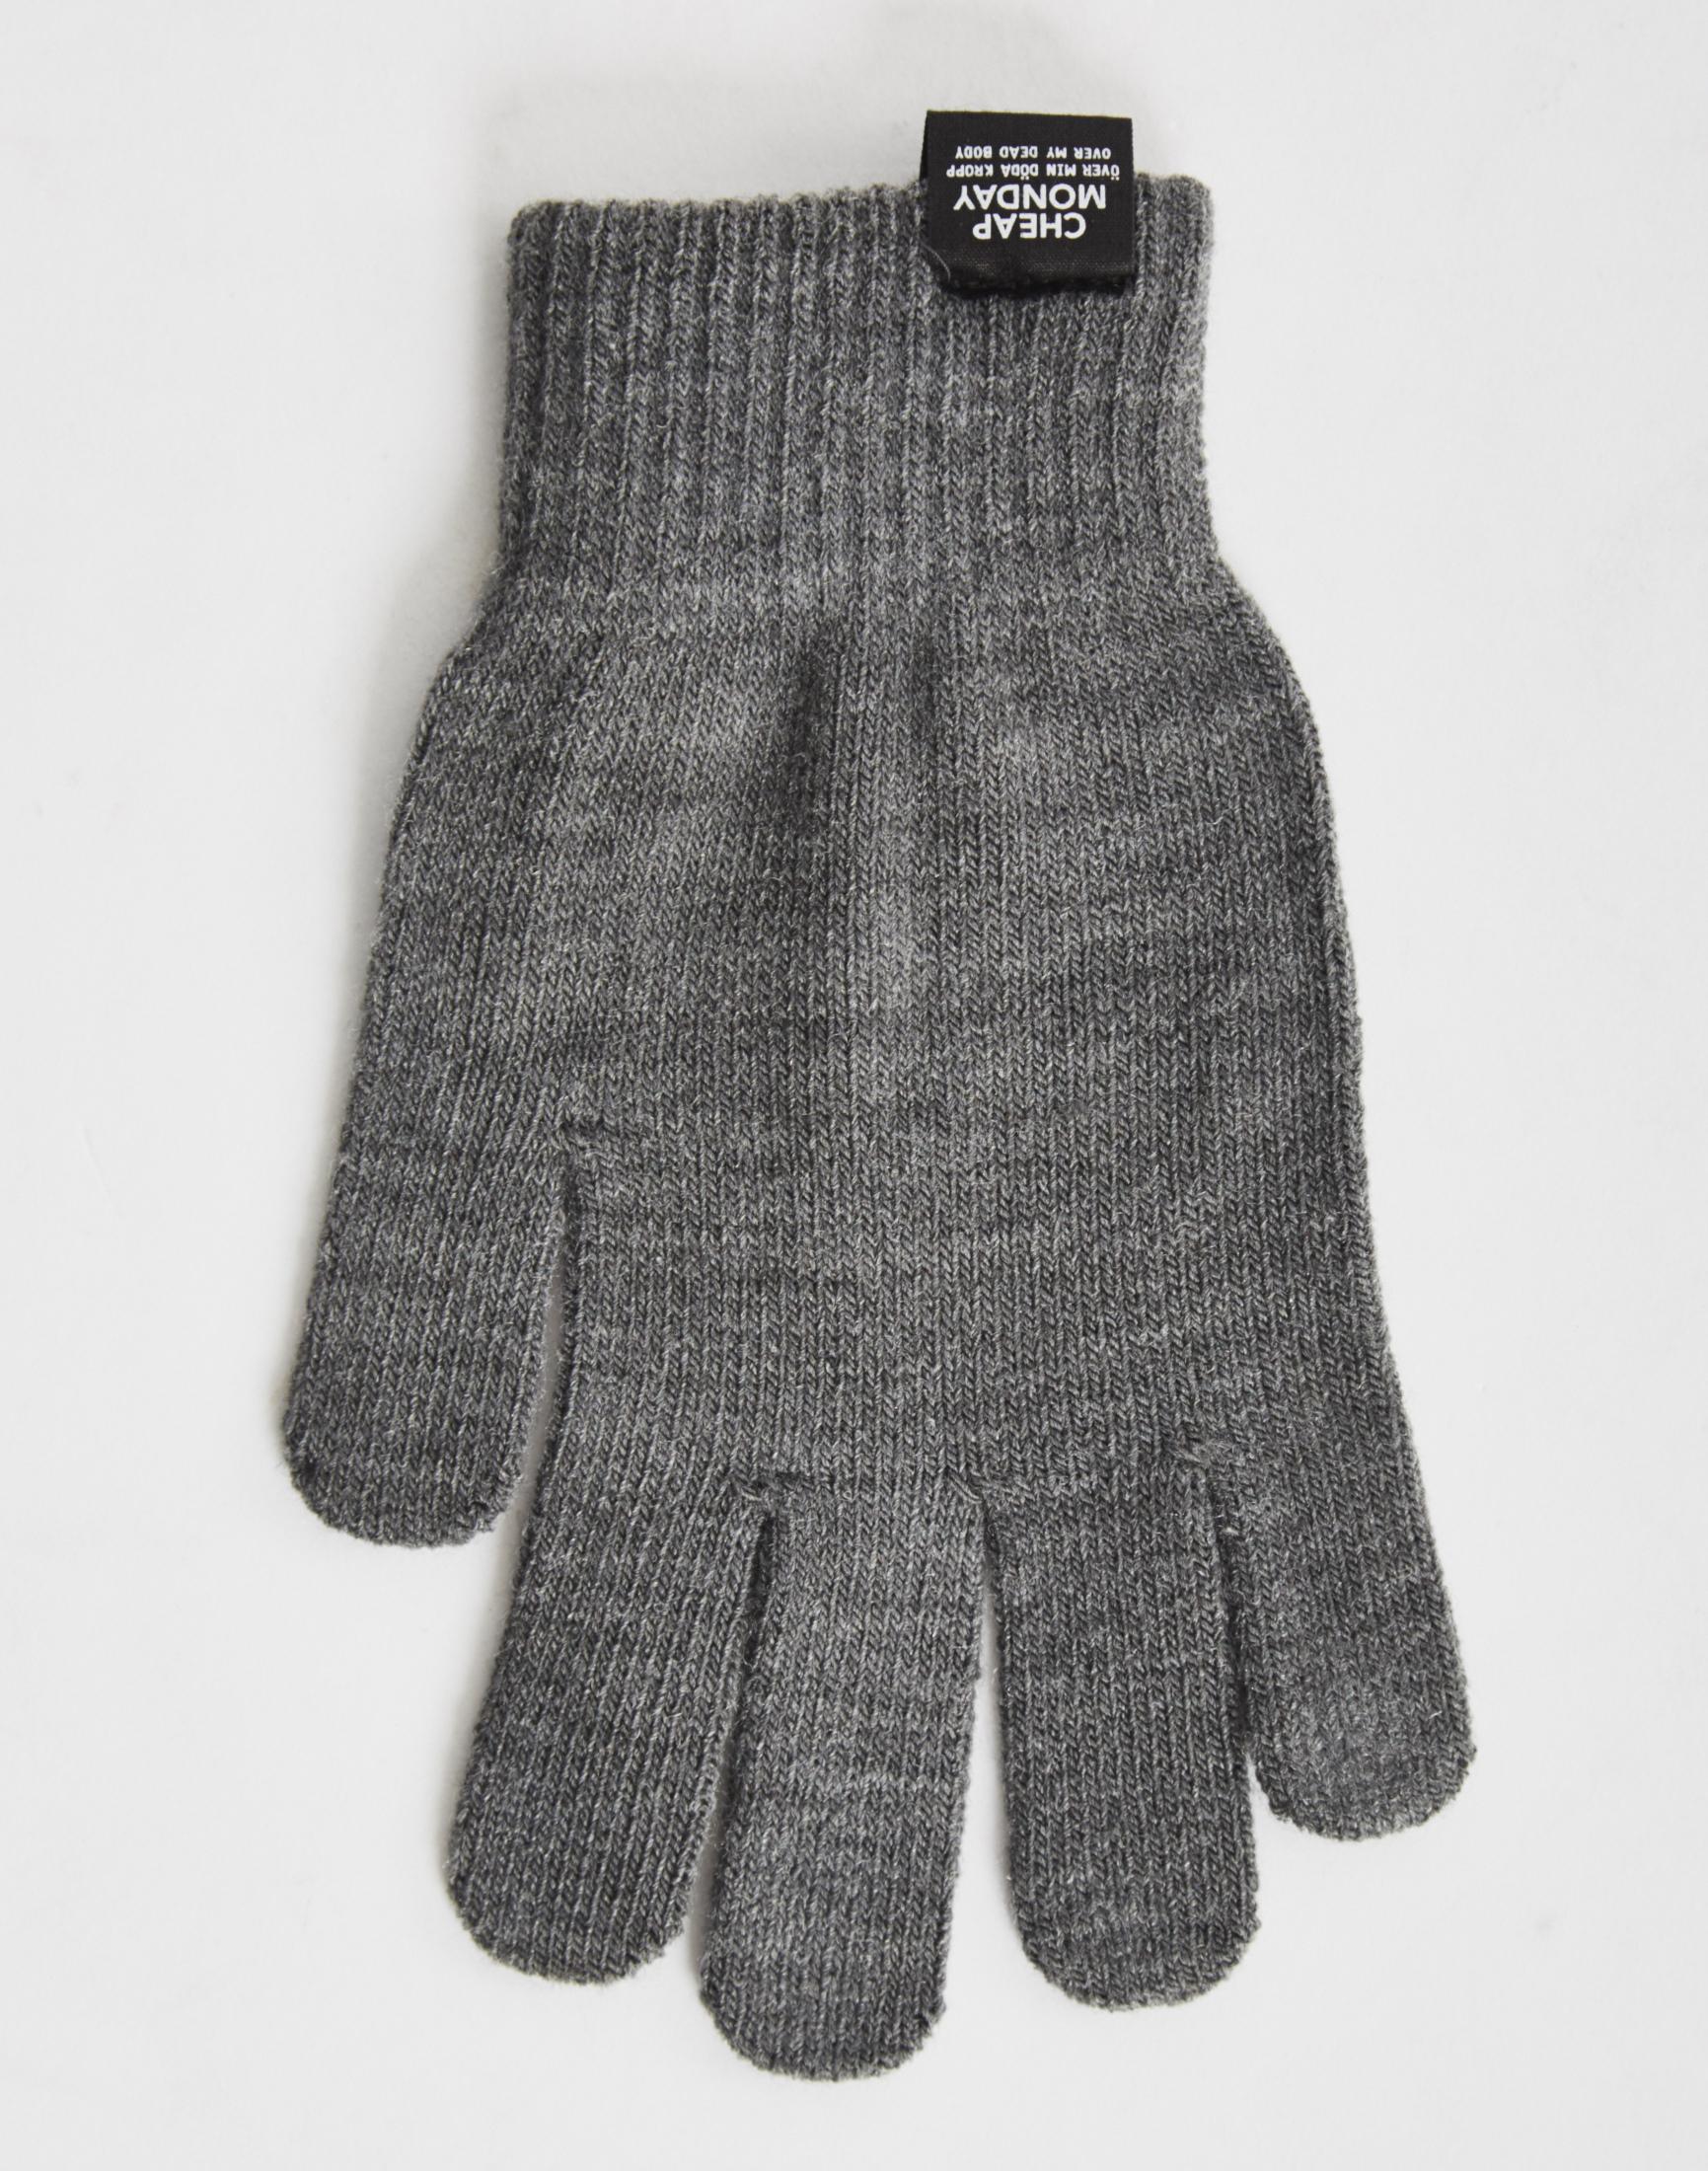 Black gloves white magic - Gallery